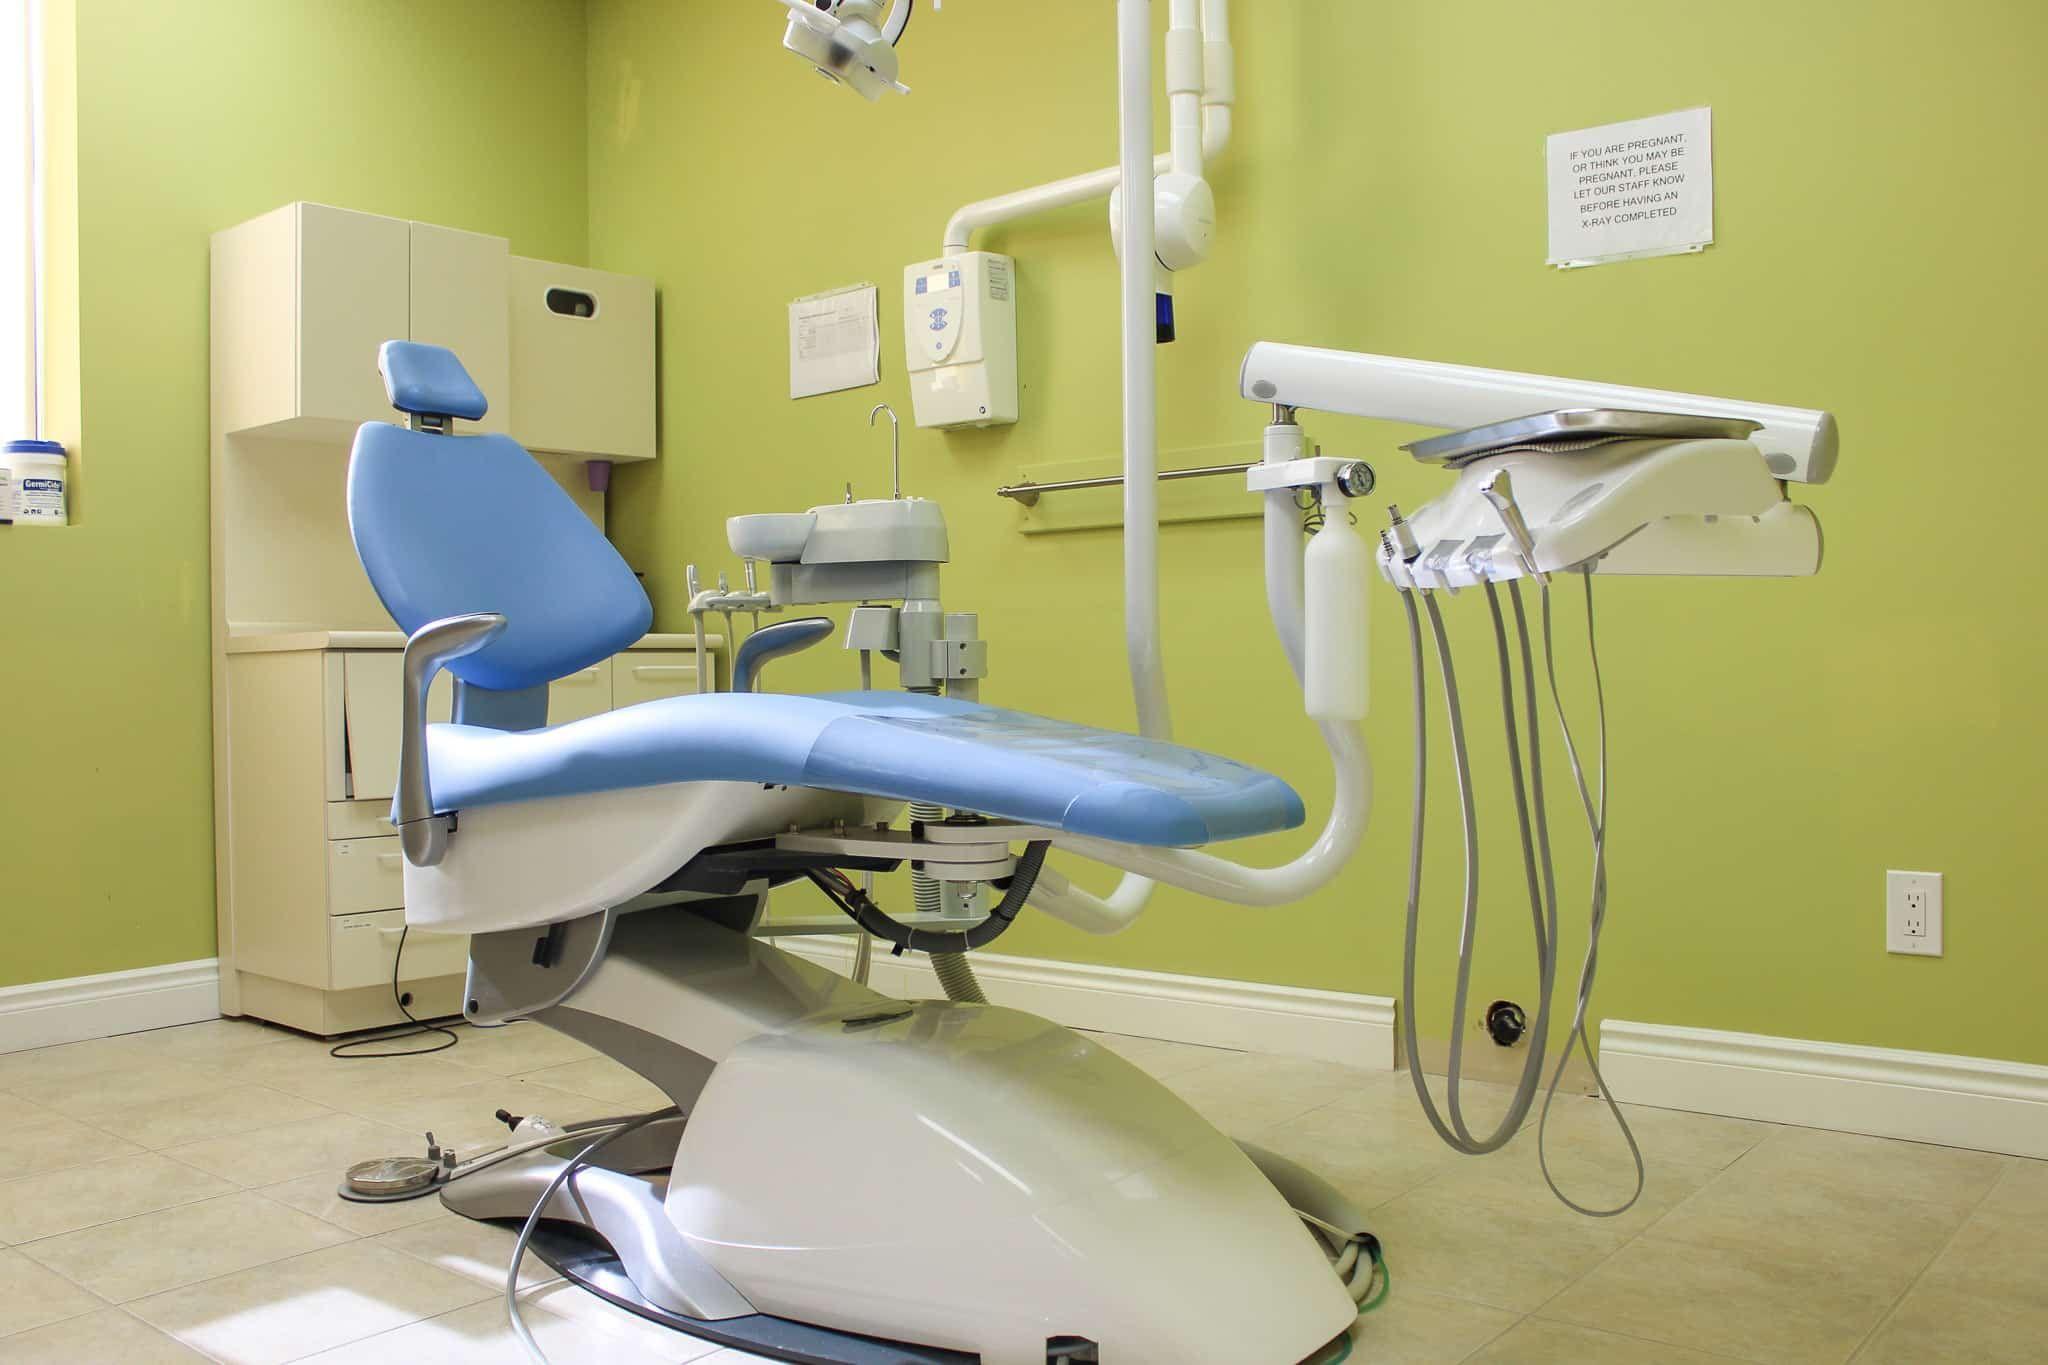 Sherwood Dental 2 Photos & 0 Reviews Health & Medical